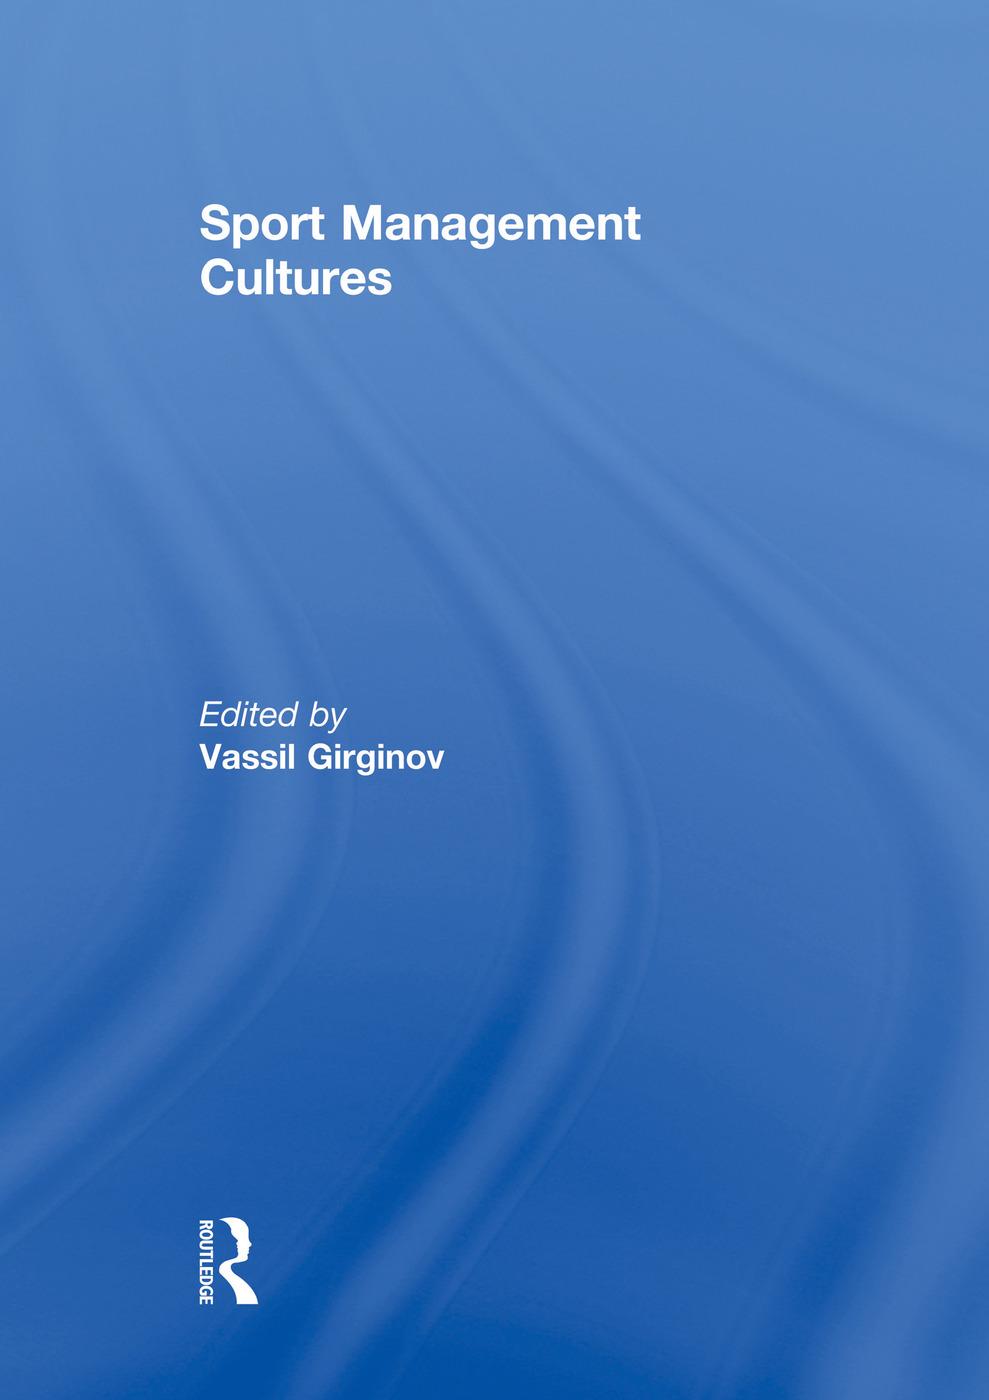 Sport Management Cultures: 1st Edition (Paperback) book cover